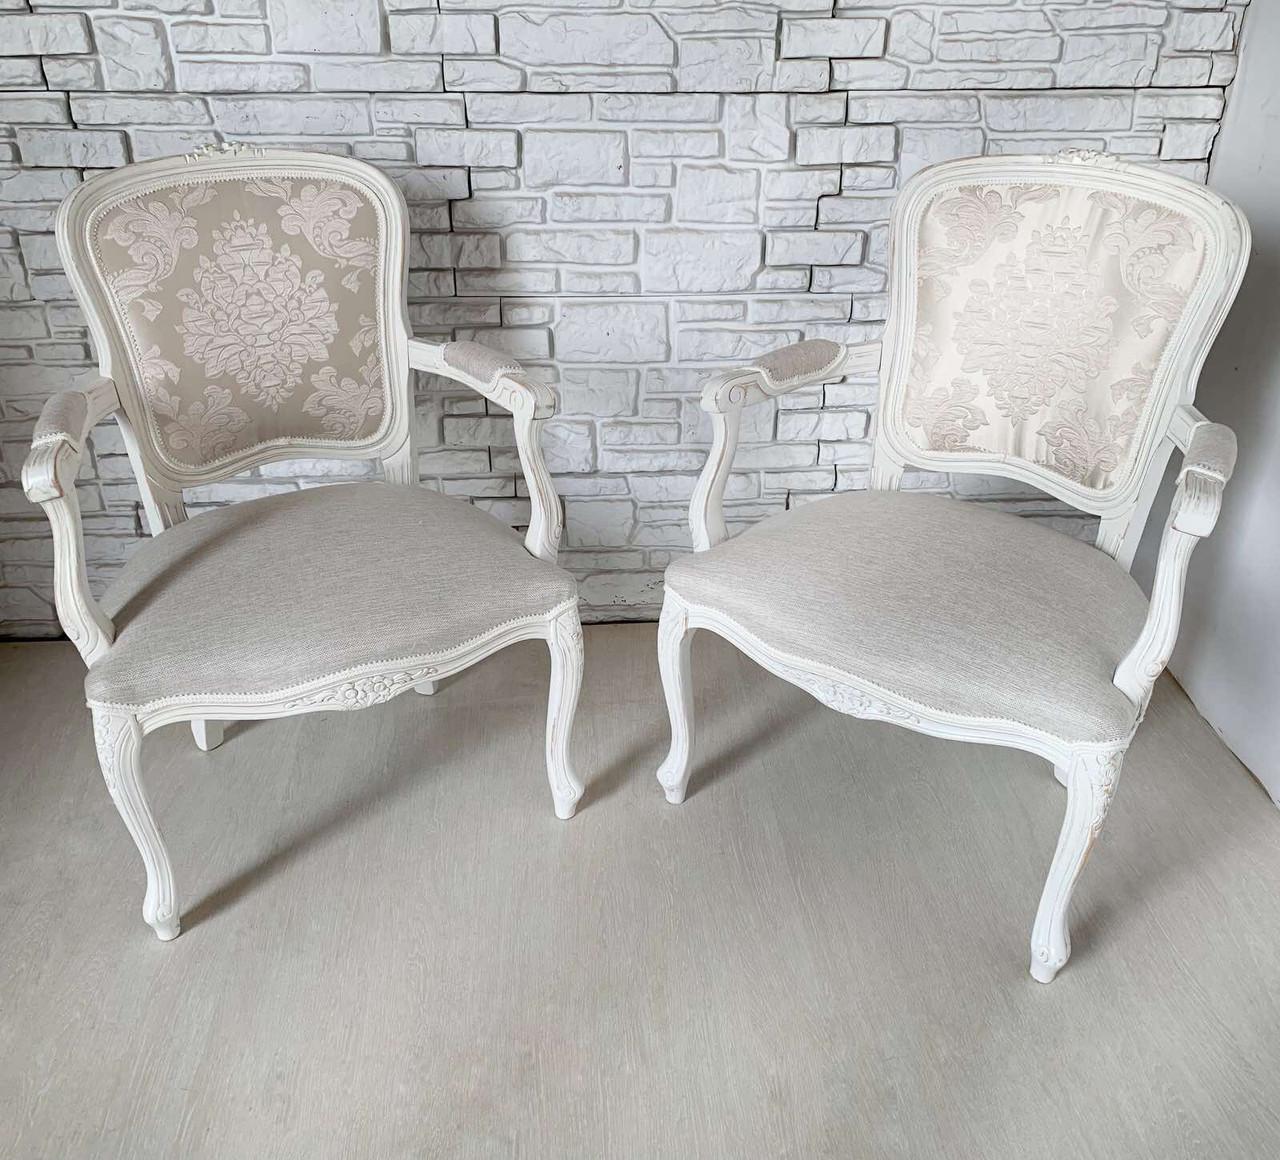 Італійське крісло бароко.  Ціна вказана за  1 шт.